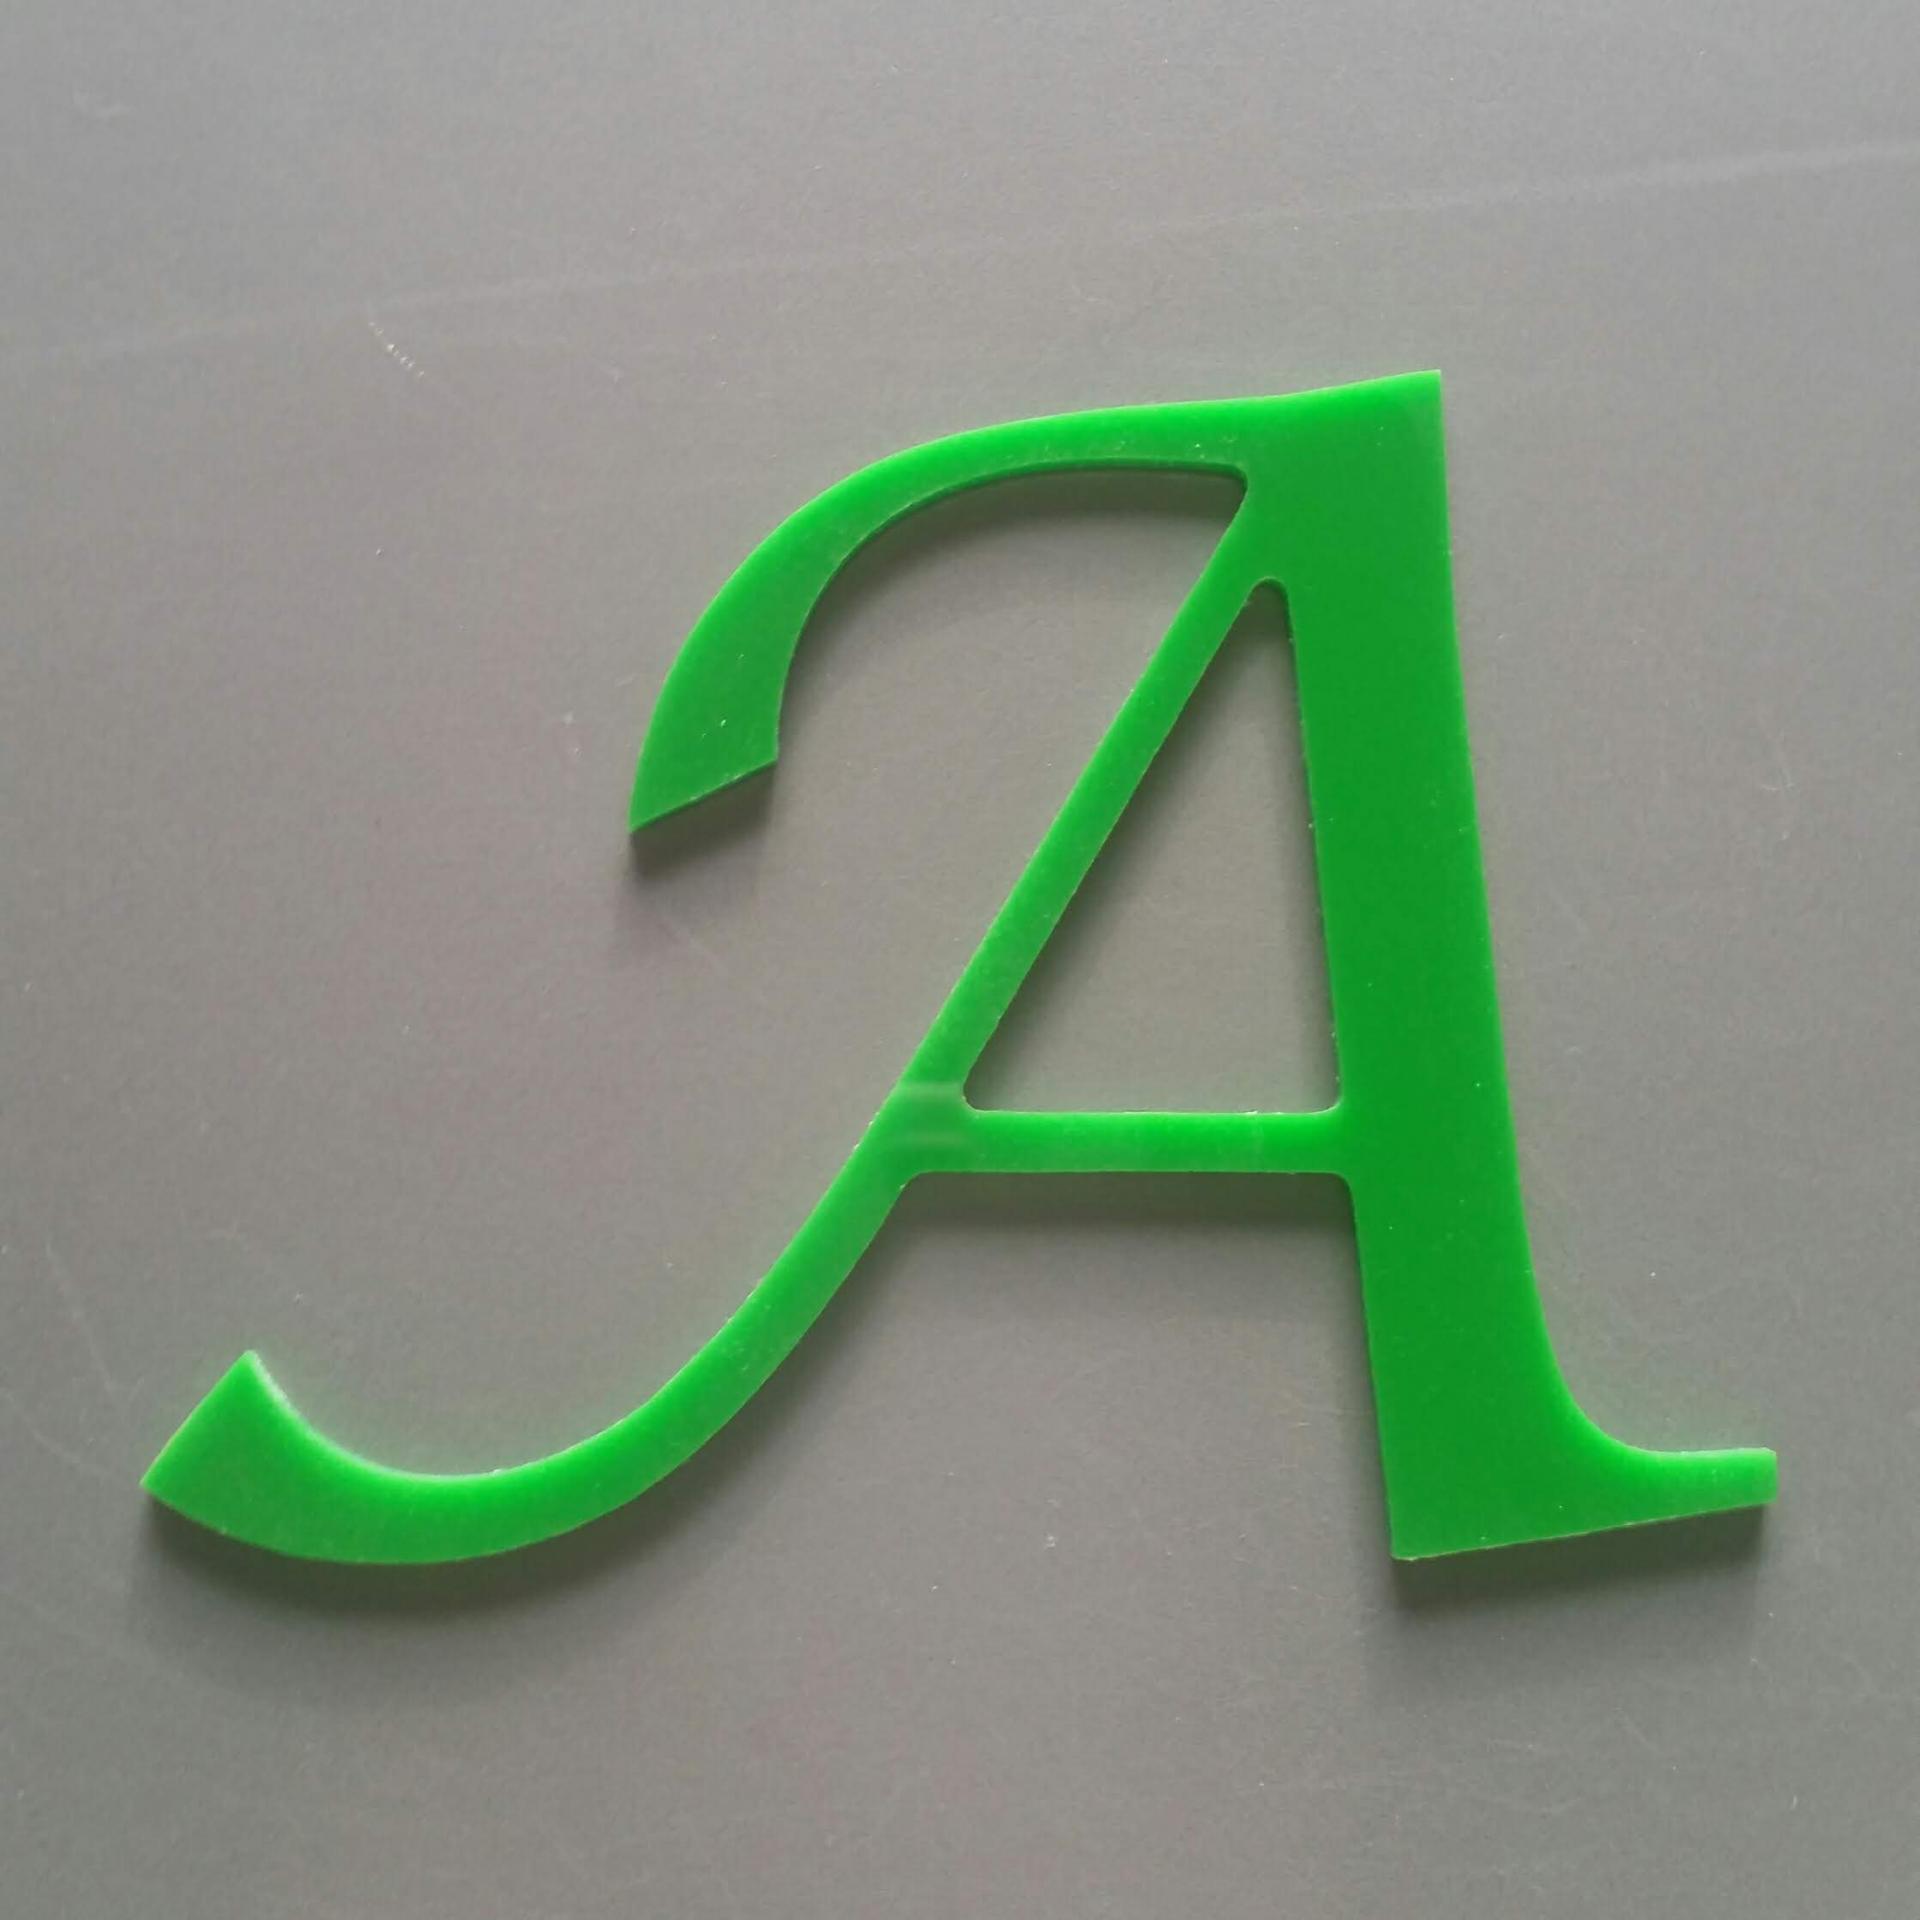 Lettre plexi lucida calligraphy